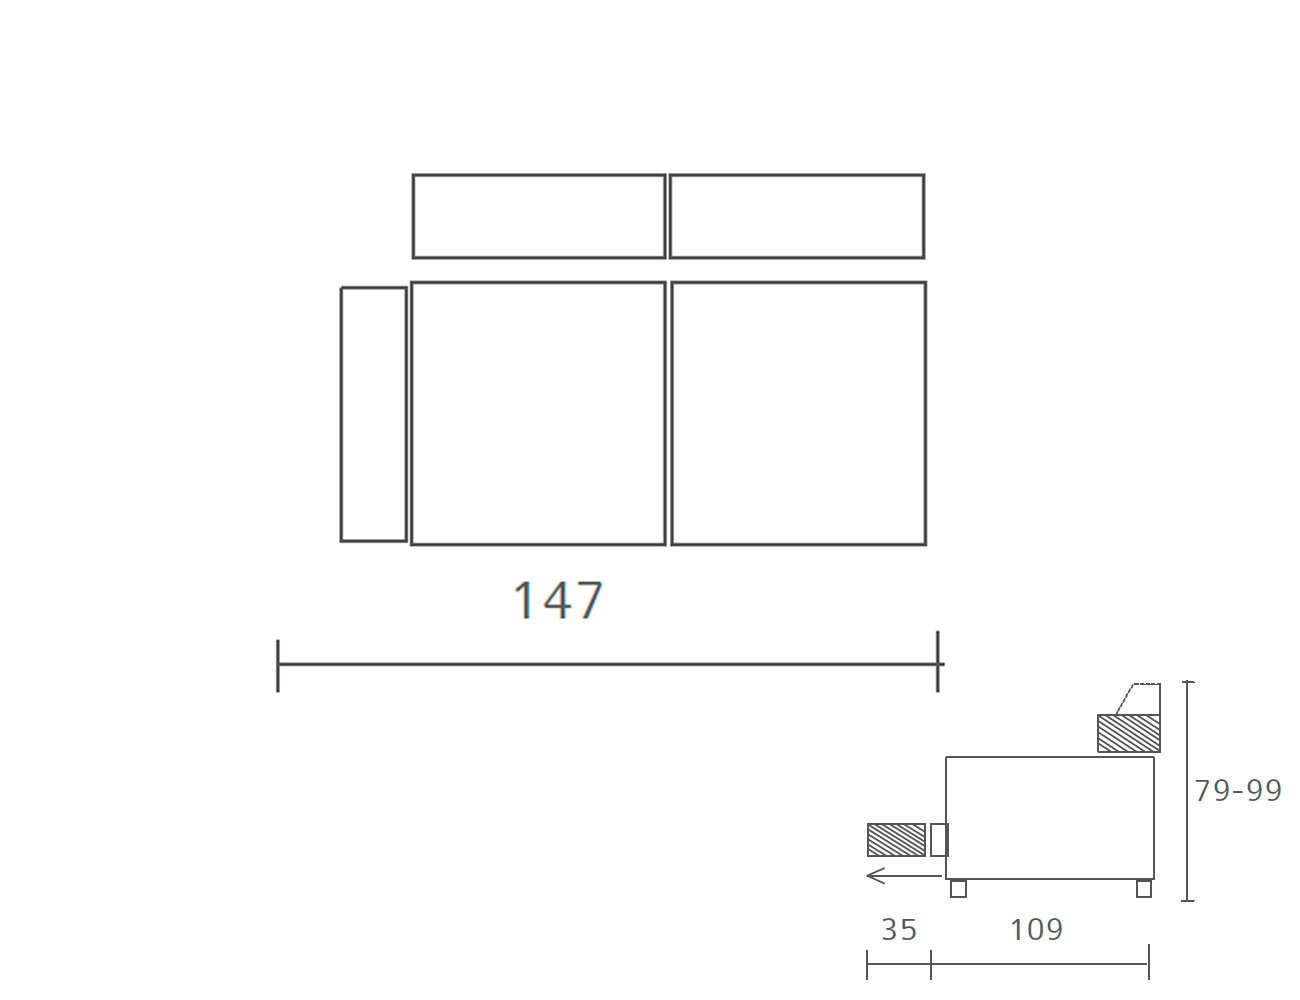 Sofa piel 2 plazas 147